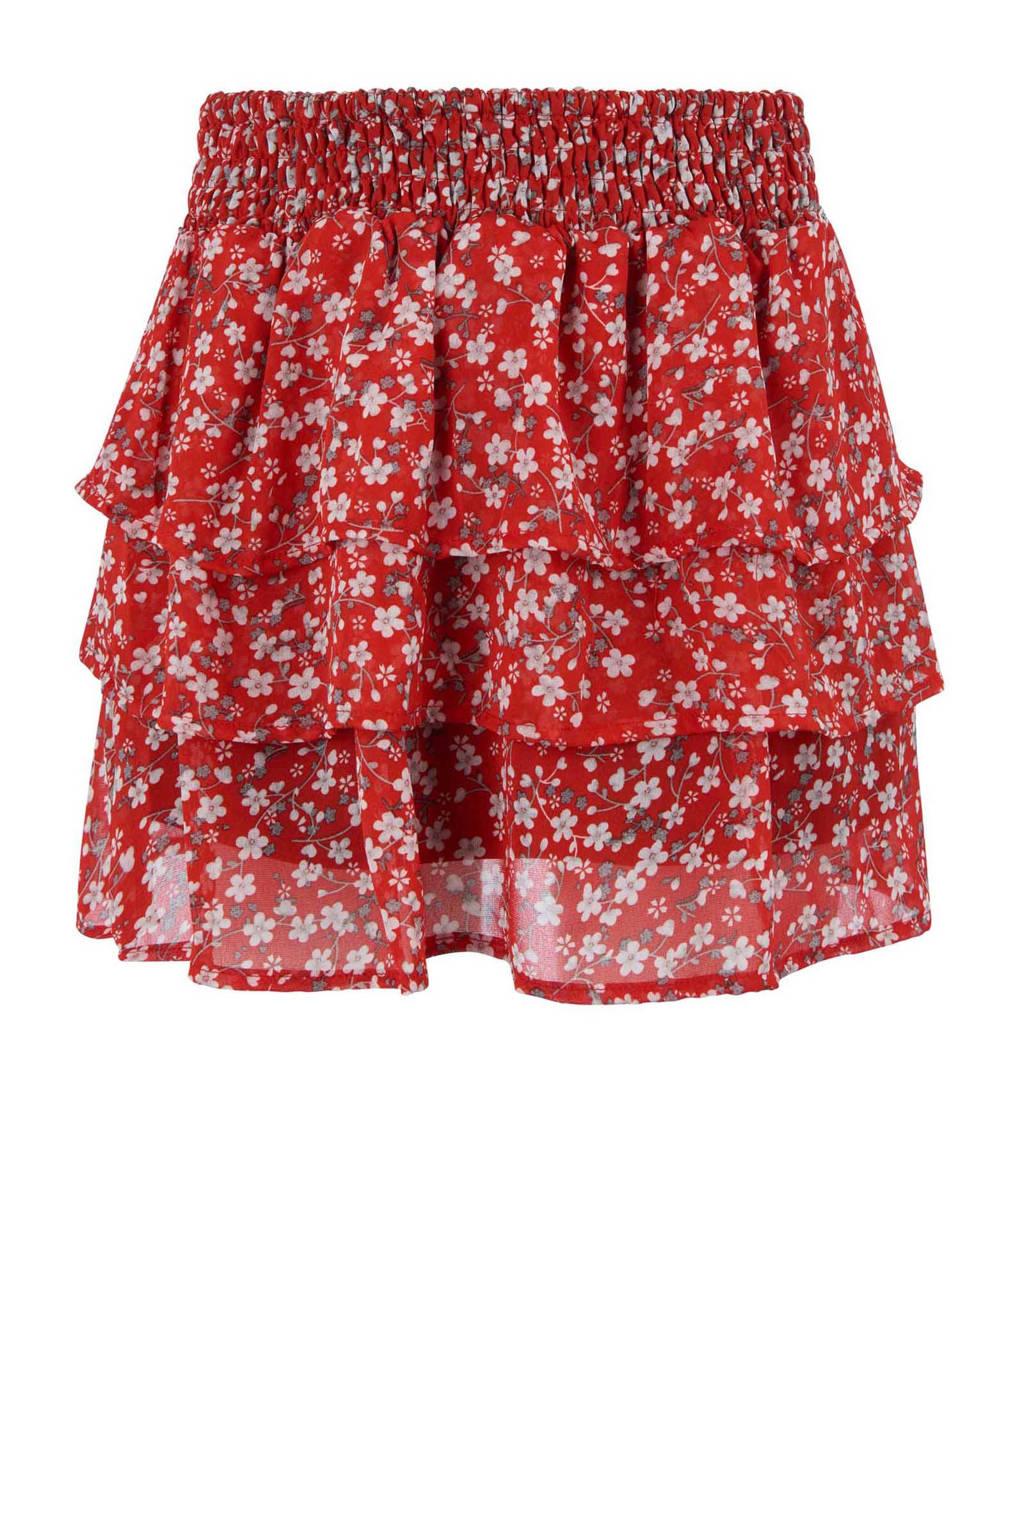 Retour Denim gebloemde rok Esmee rood, Rood/wit